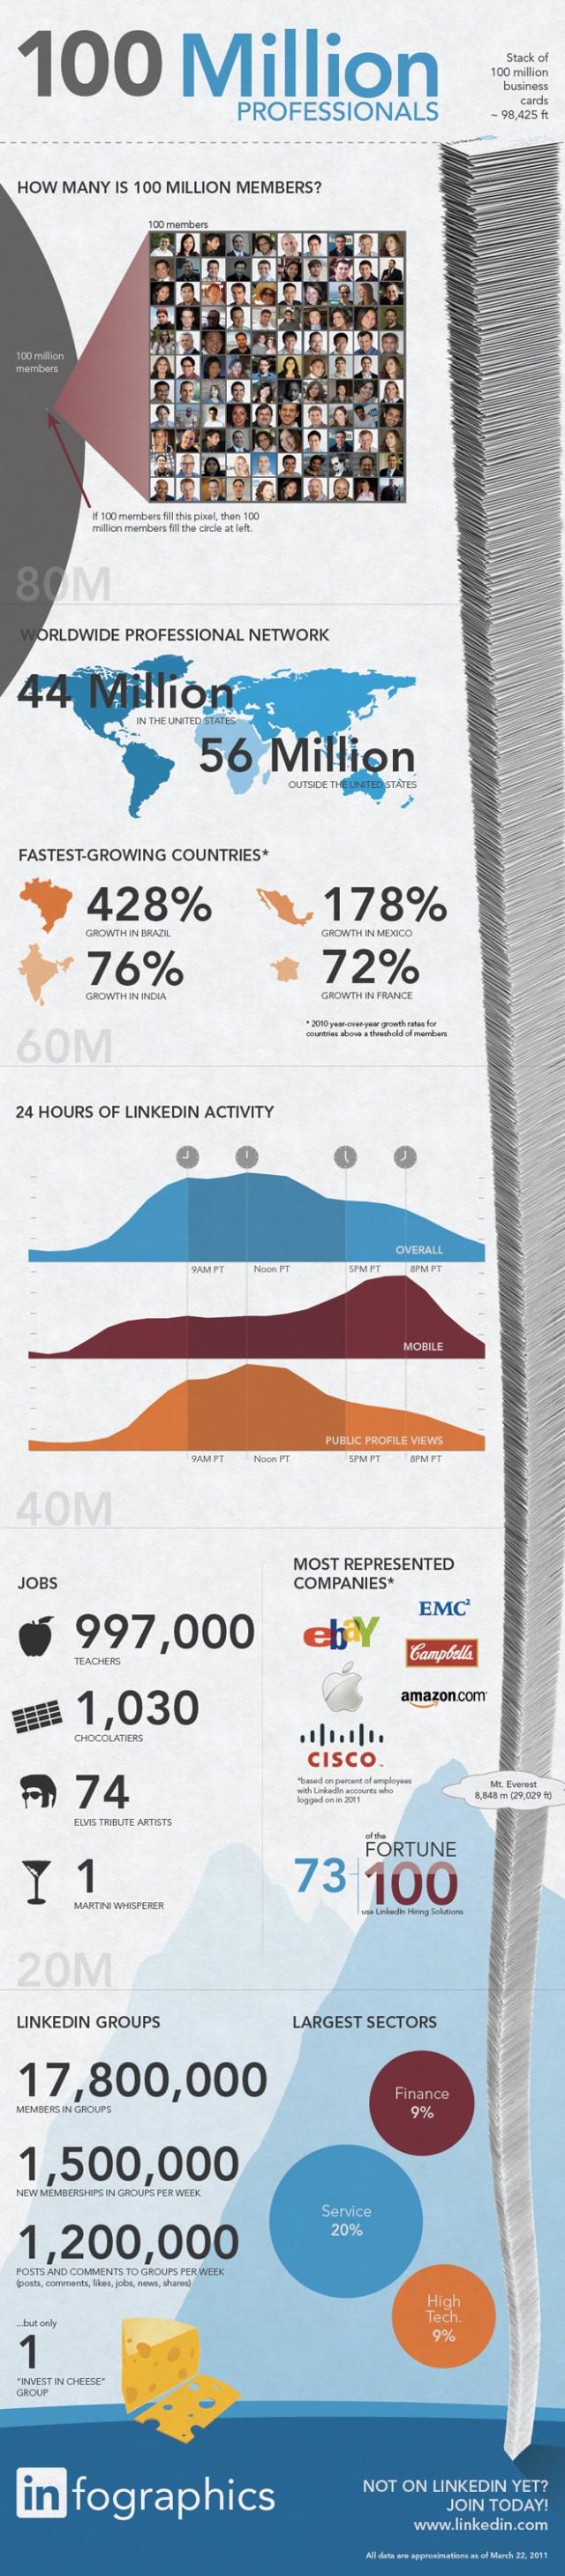 100 millones de profesionales en Linkedin